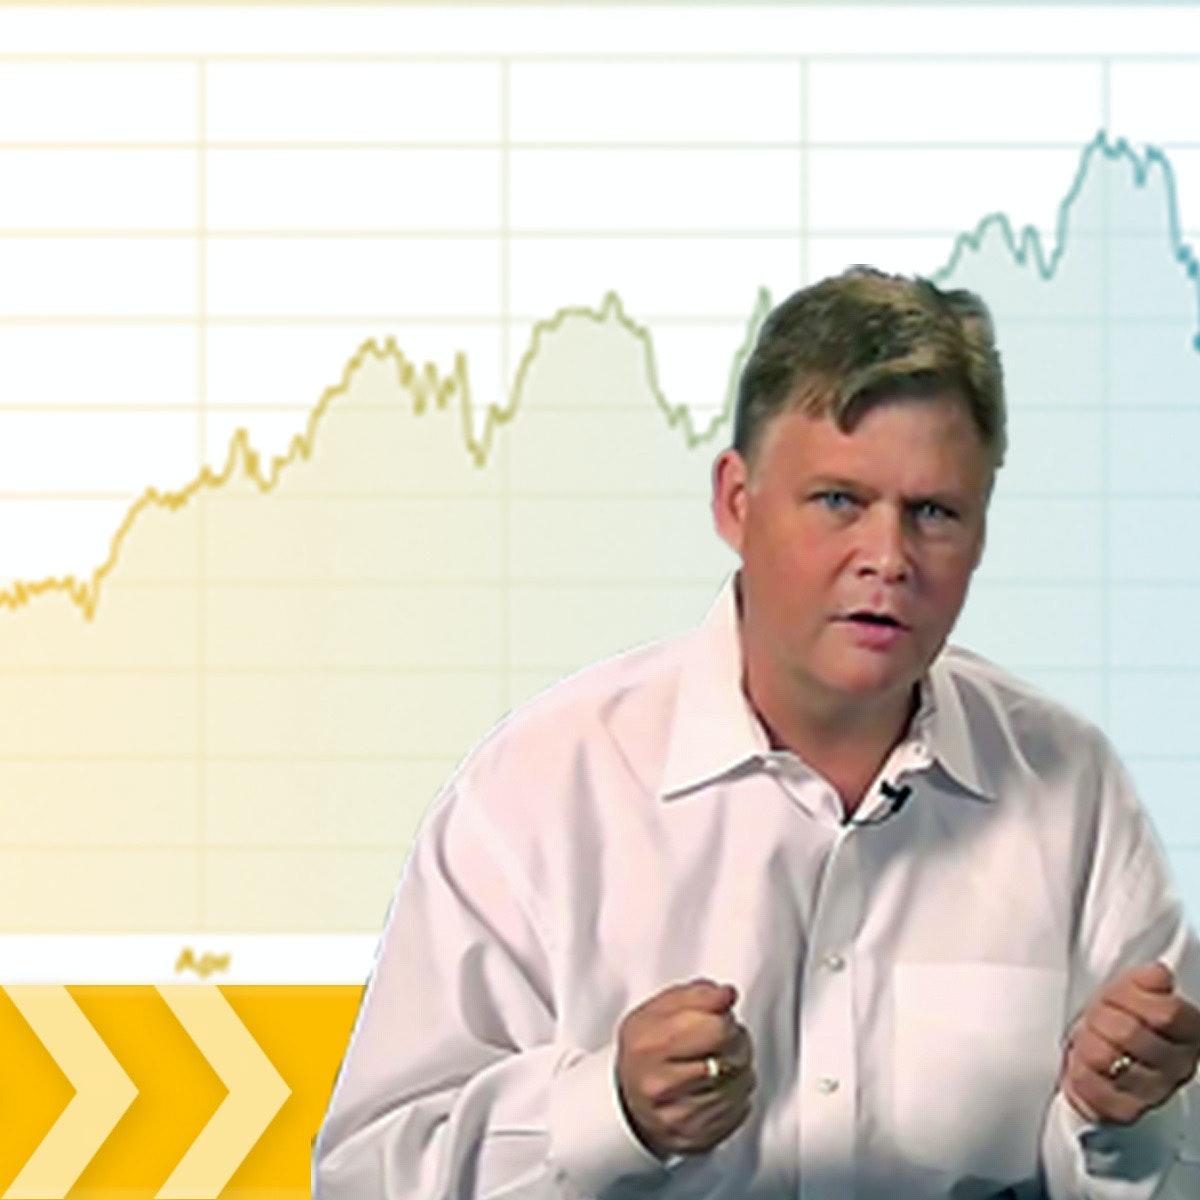 Computational Investing, Part I